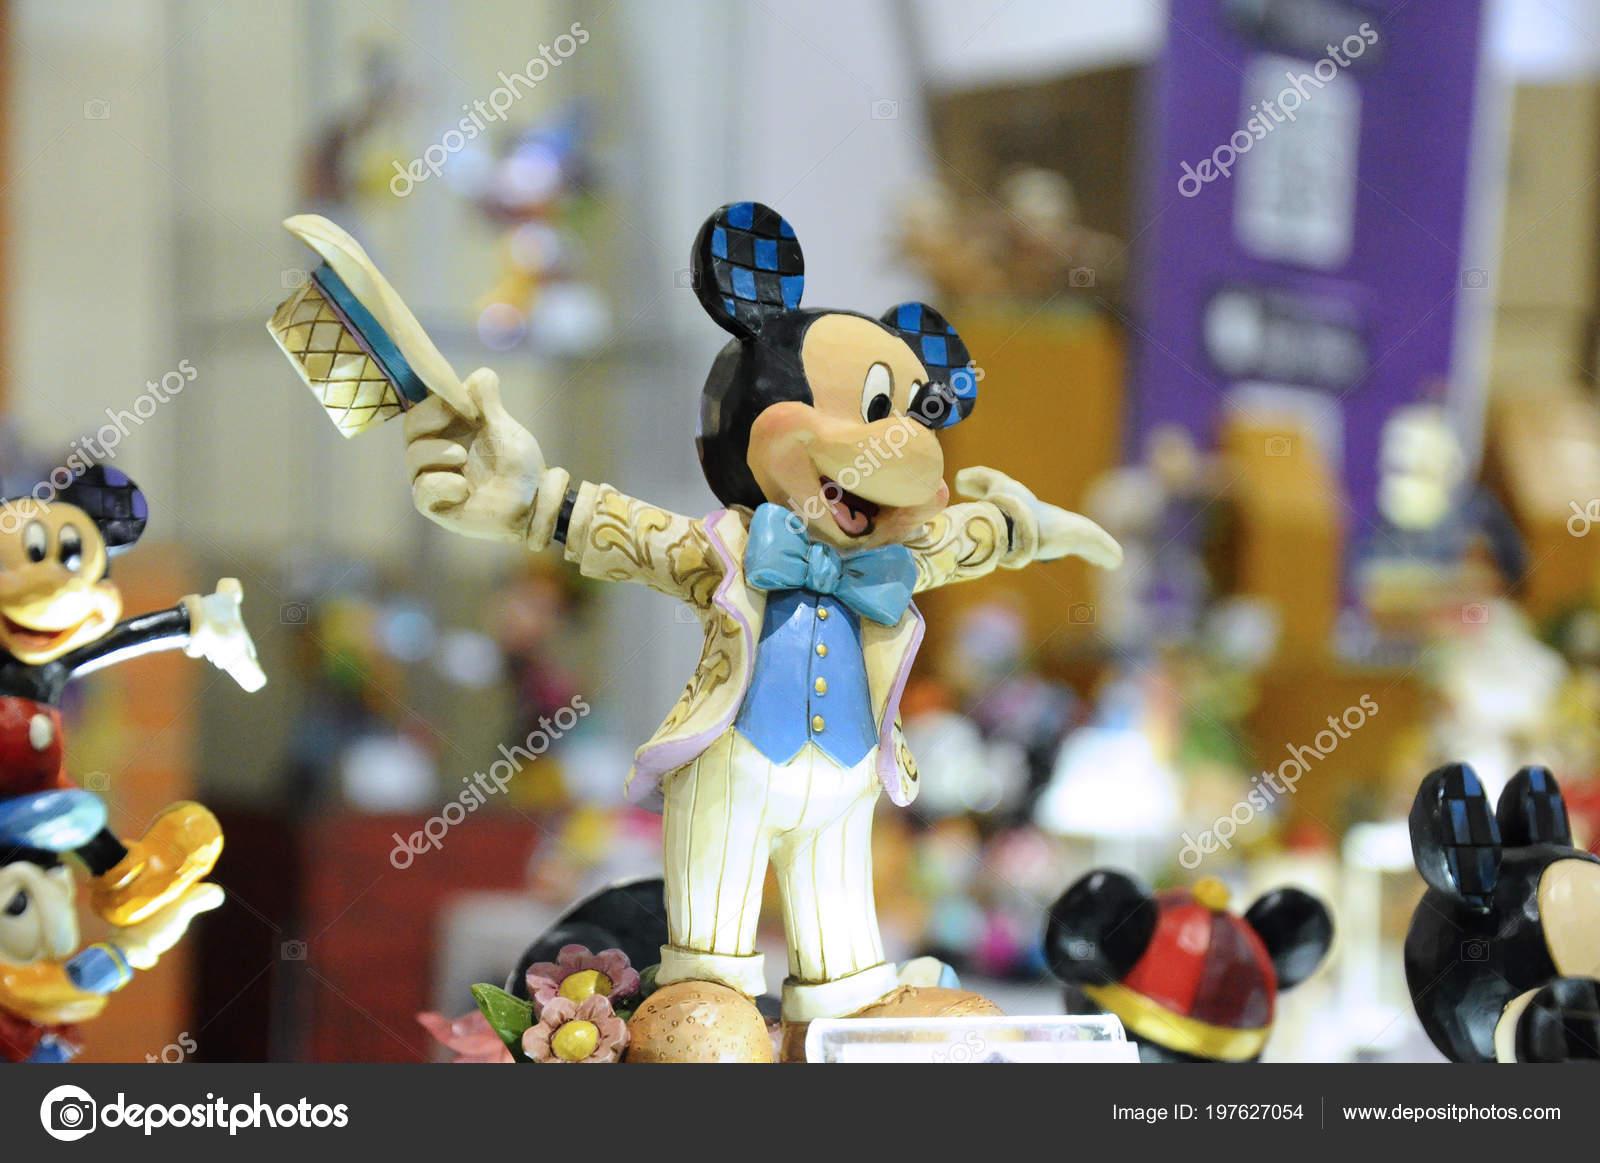 Immagini di cartoni animati disney portalebambini